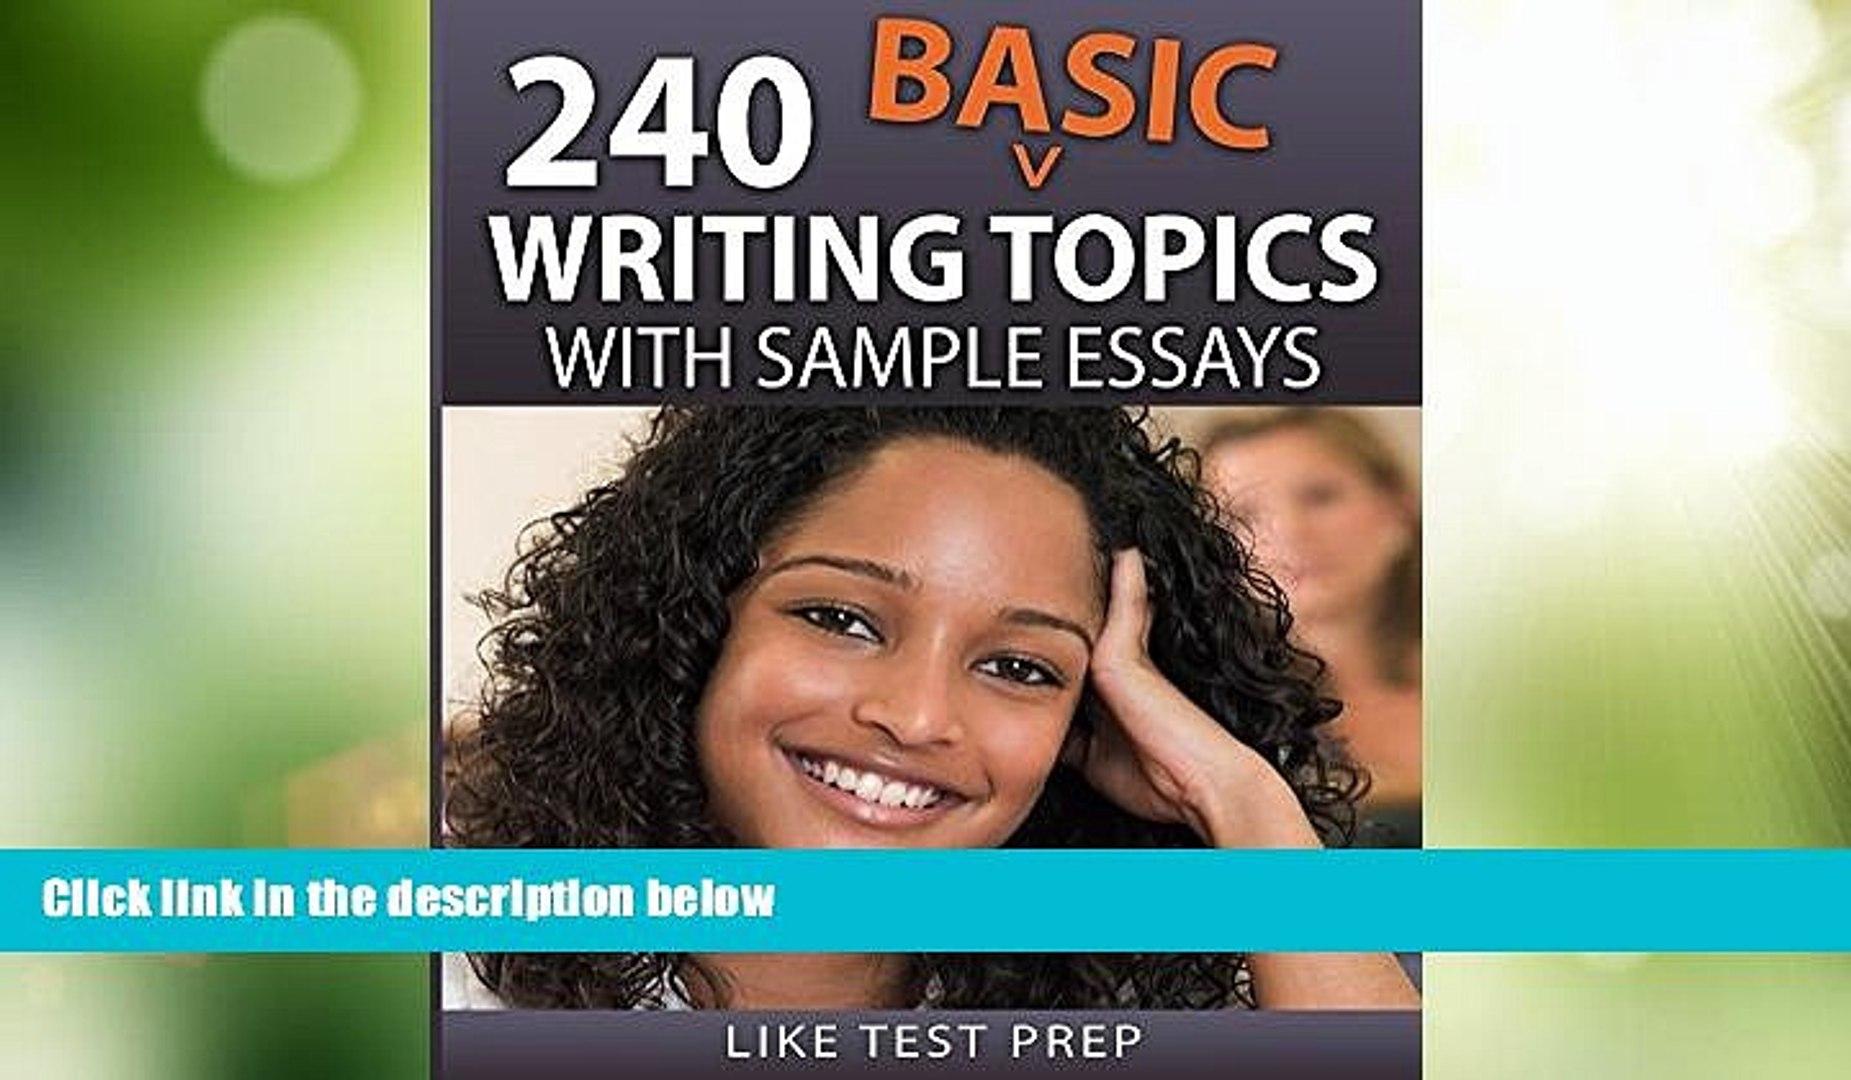 Best Price 240 Basic Writing Topics (120 Basic Writing Topics) LIKE Test Prep For Kindle